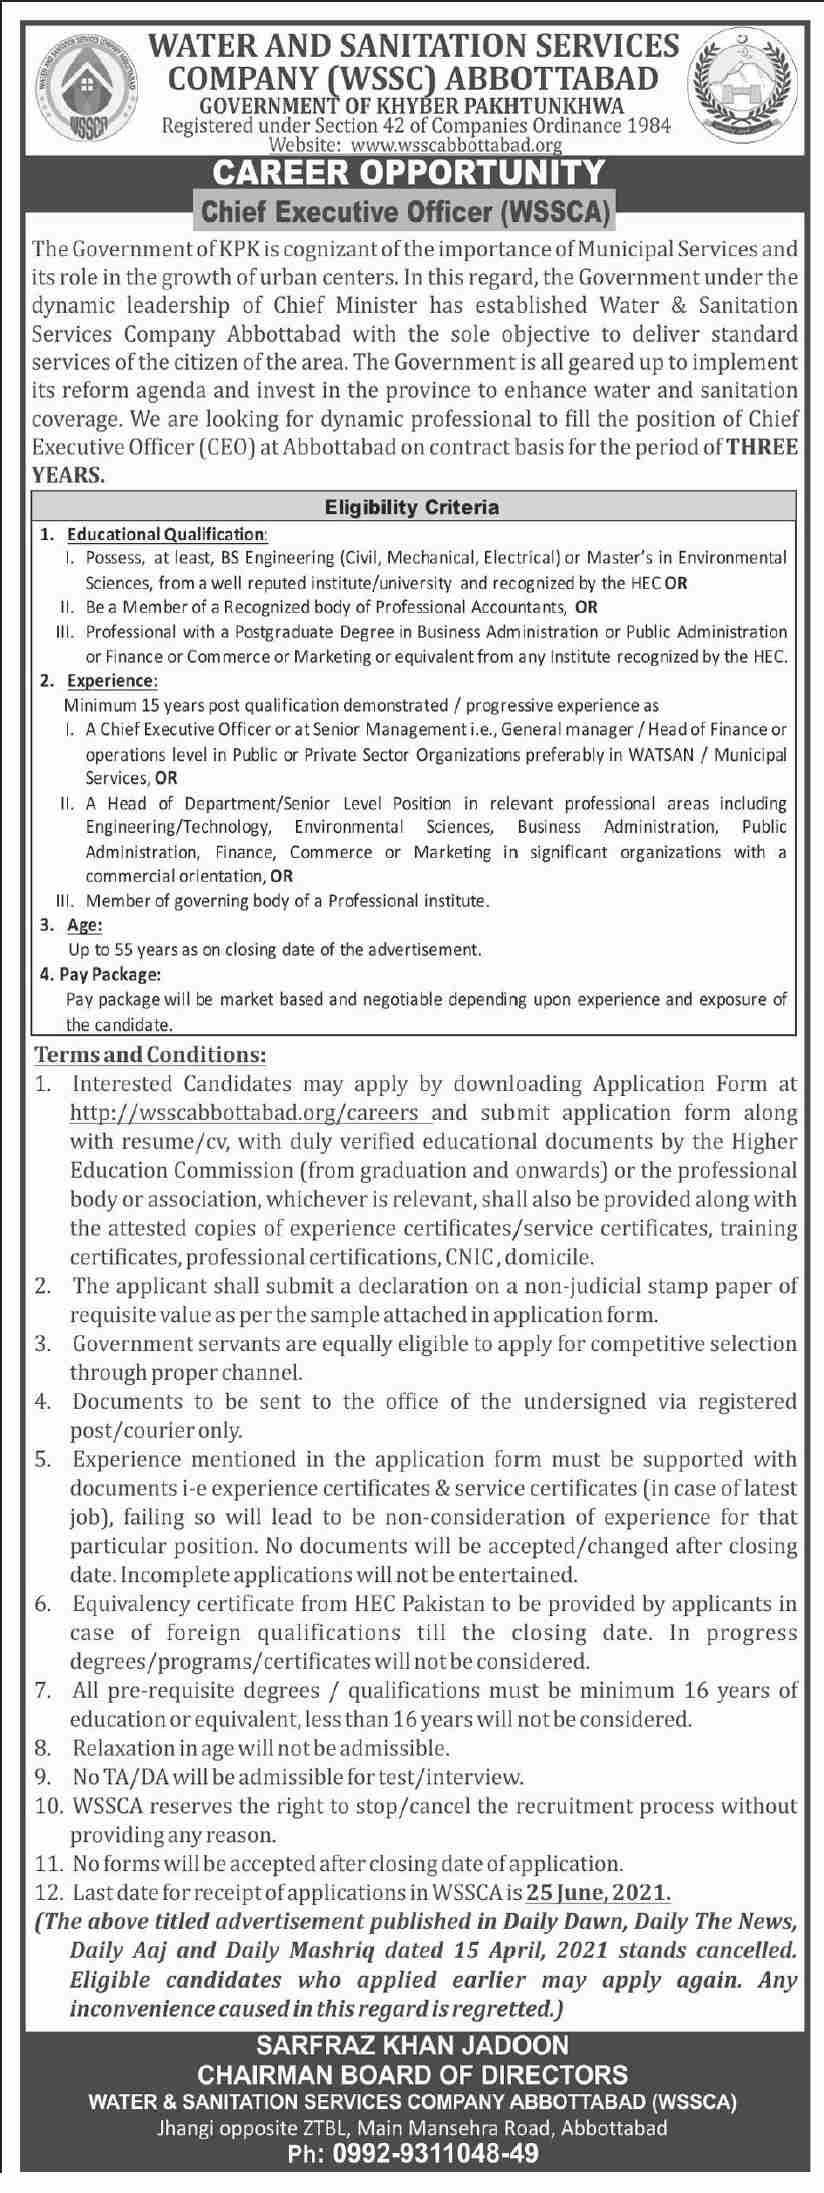 WSSC Jobs 2021 - Water & Sanitation Services Company (WSSC) Abbottabad Jobs 2021 in Pakistan